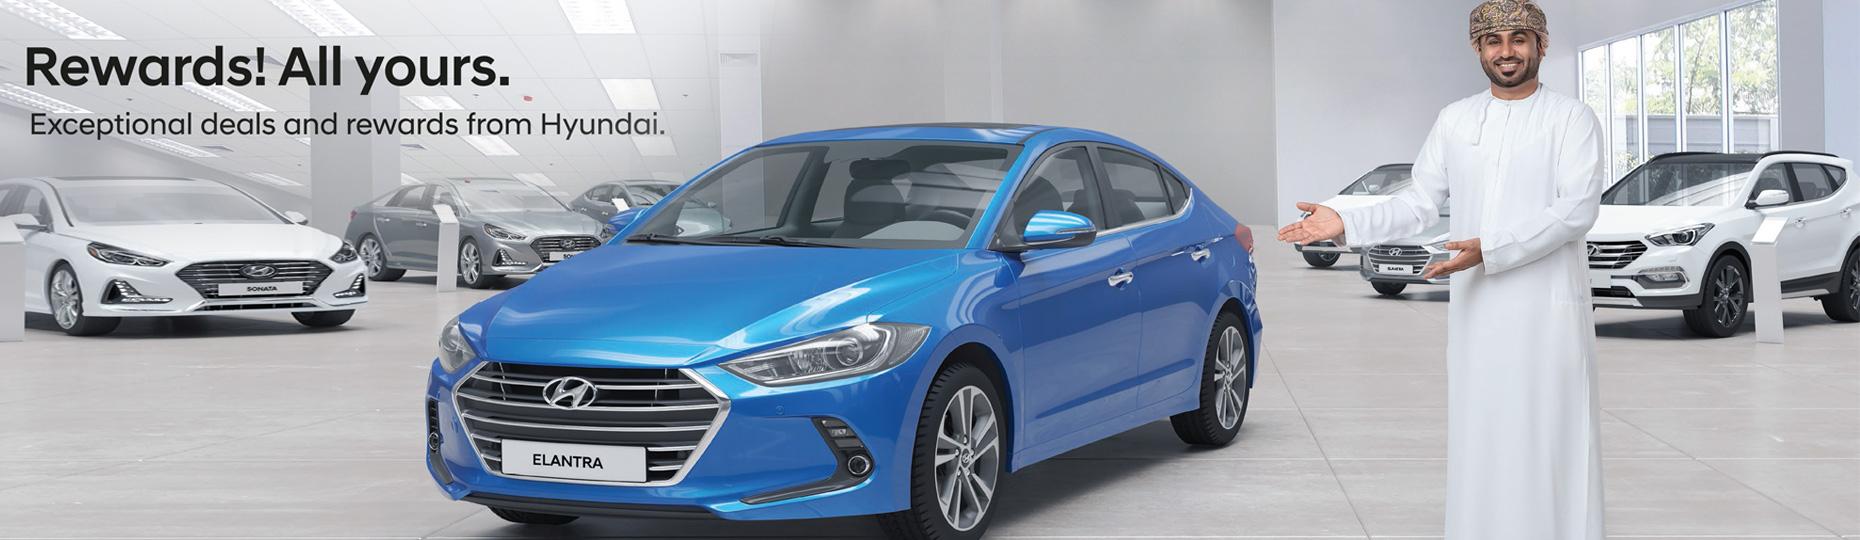 Hyundai's designer is polishing 1:4 scale 3d clay model of a Hyundai car